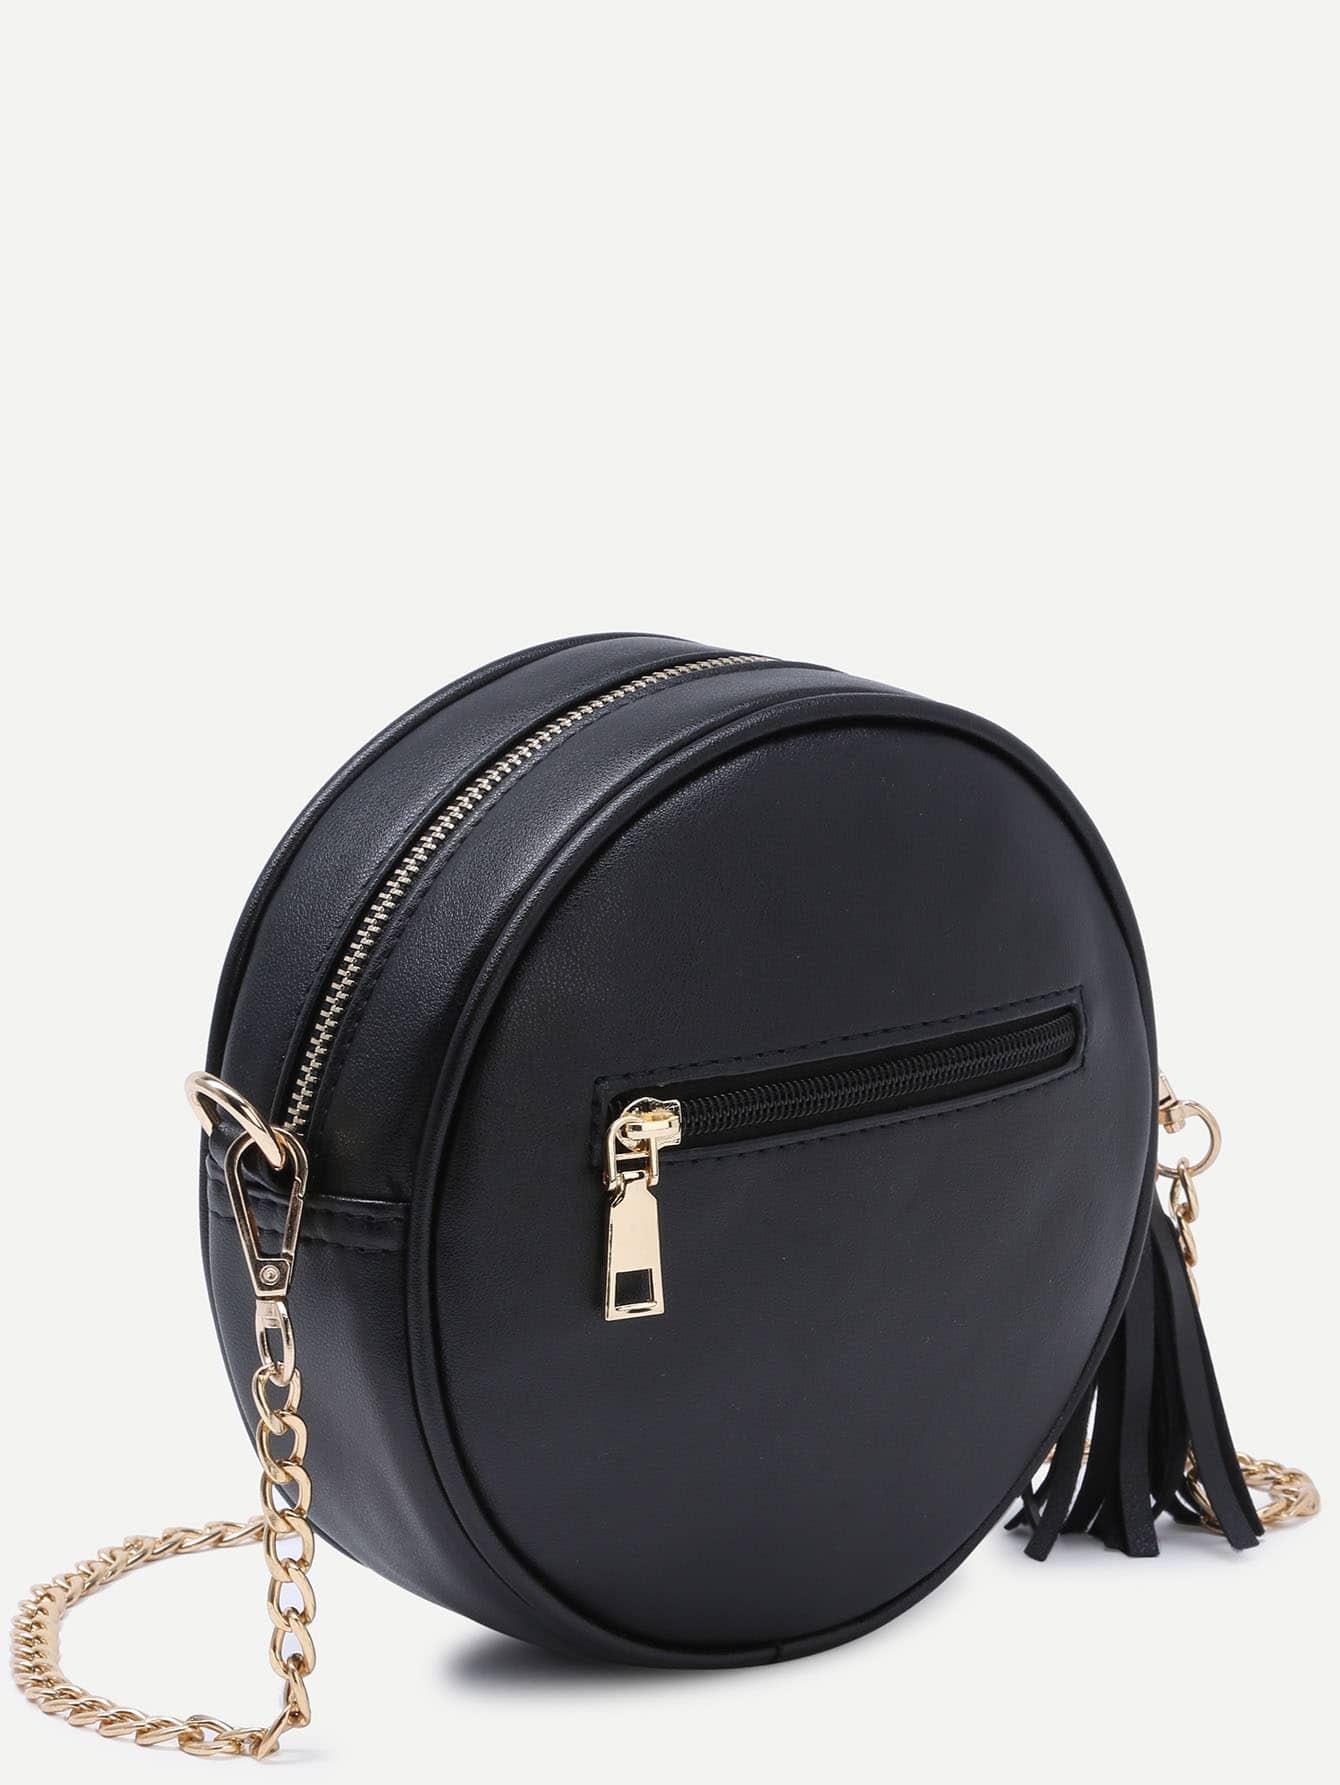 bag160811308_2